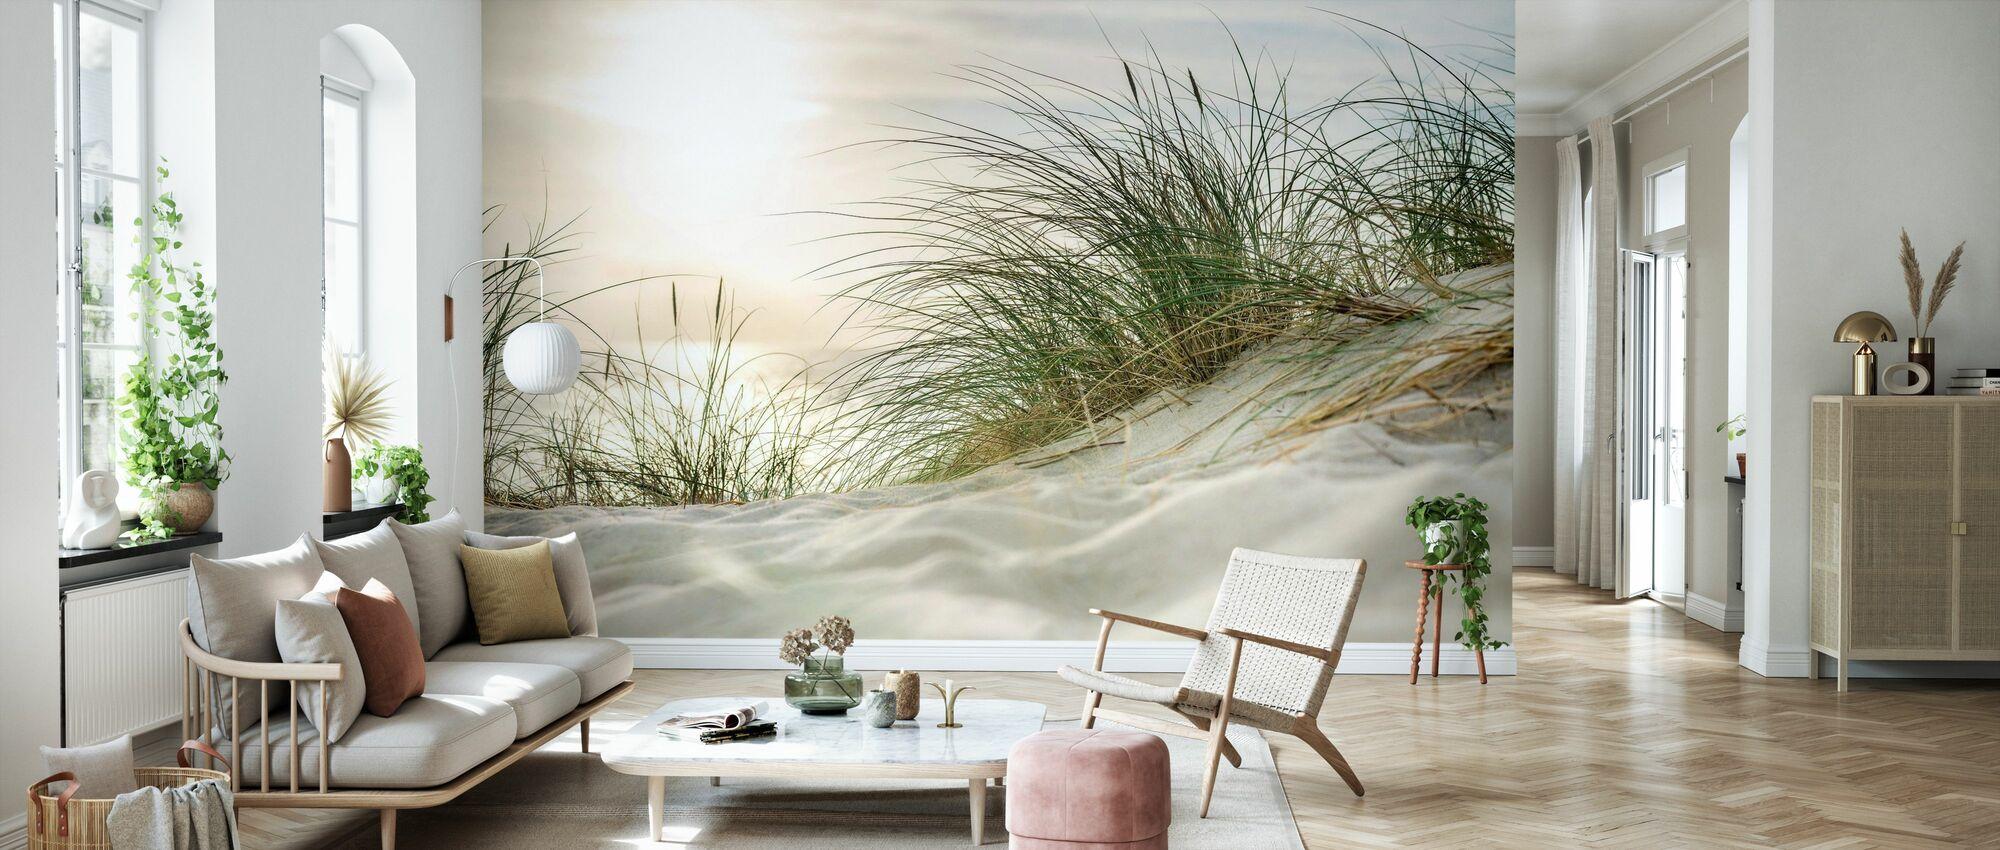 Sandy Dunes and Sea - Wallpaper - Living Room